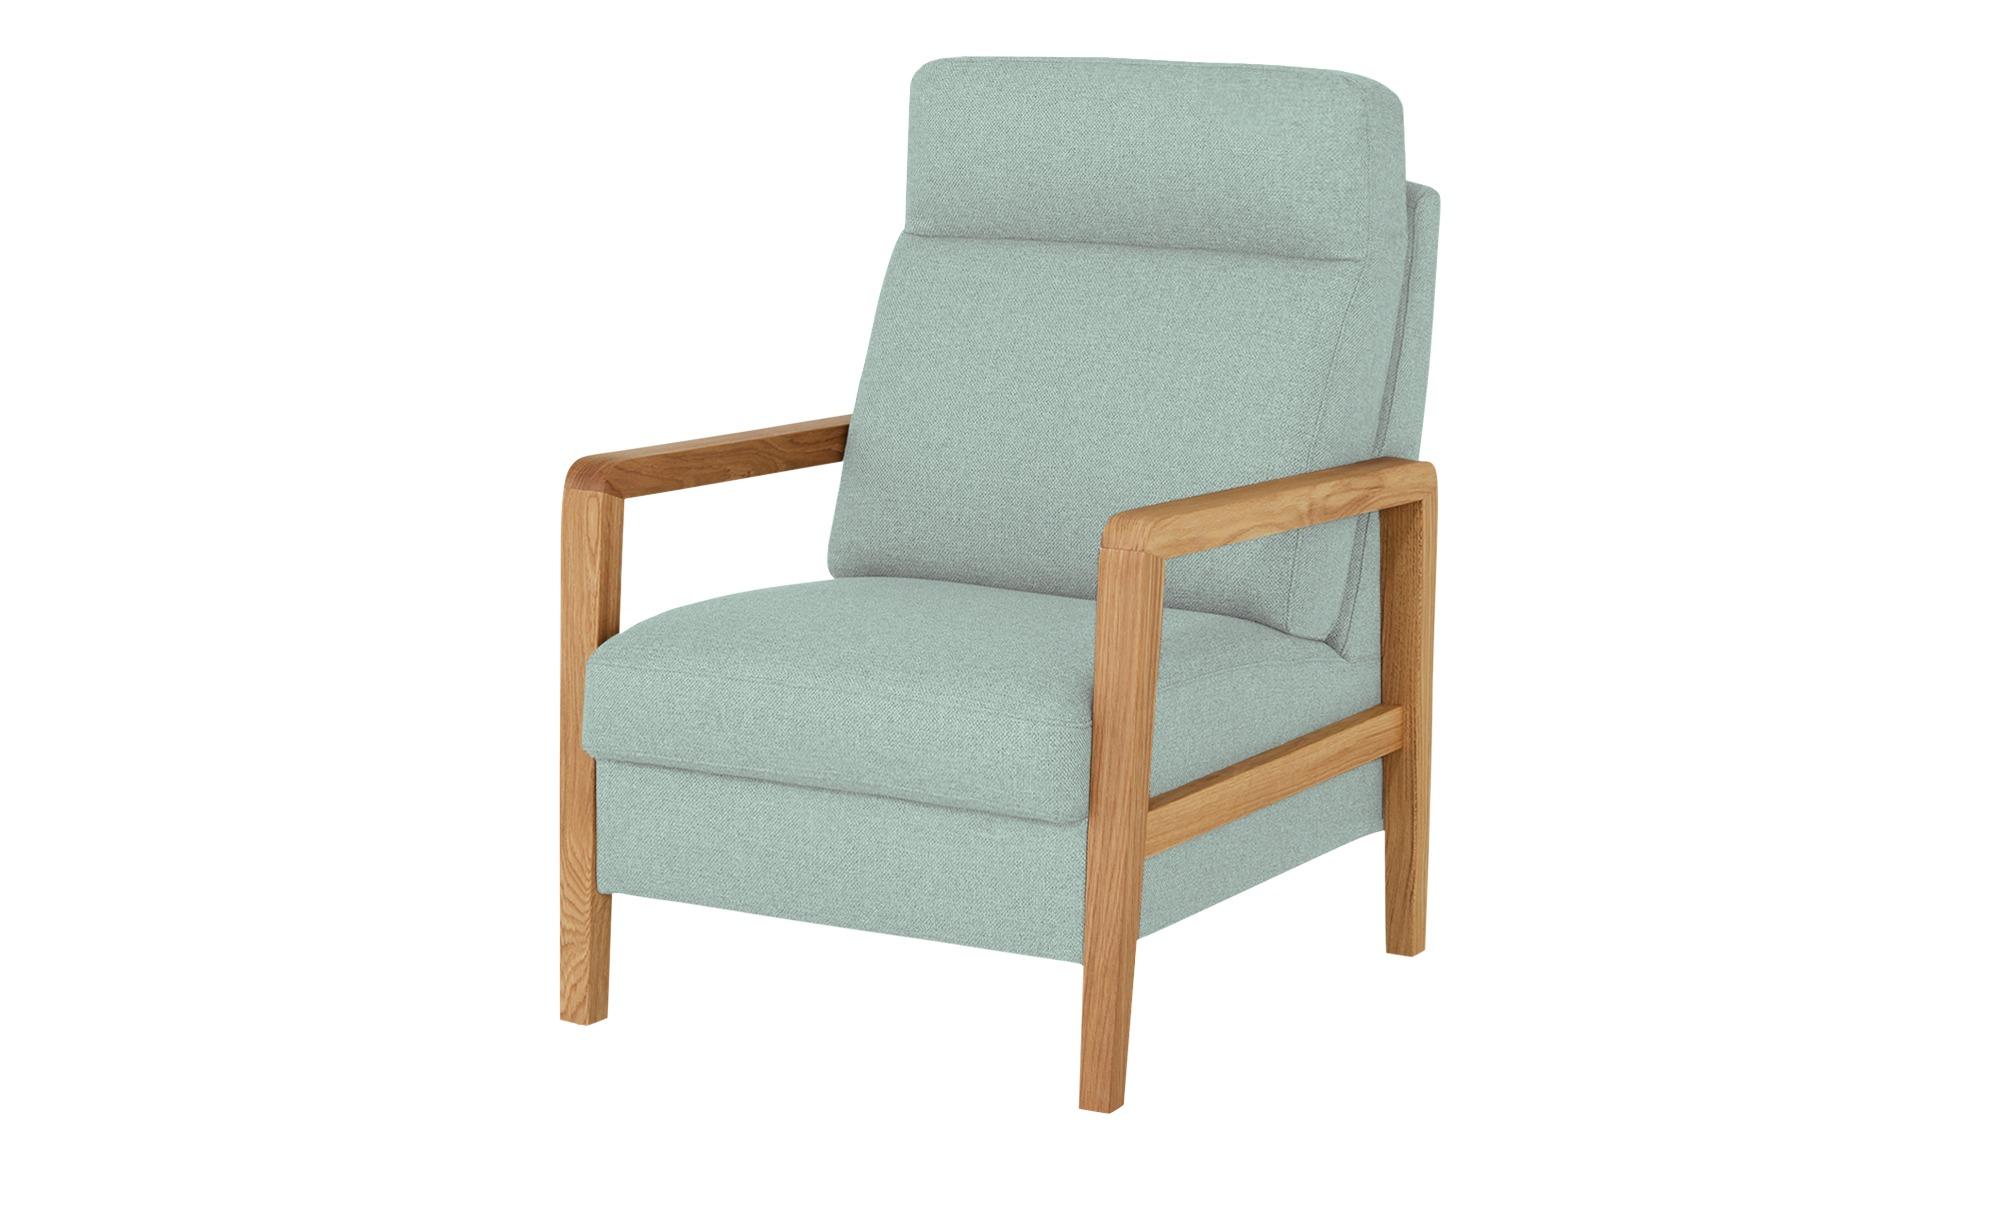 Wohnwert Sessel  Petra ¦ blau ¦ Maße (cm): B: 71 H: 103 T: 89 Polstermöbel > Sessel > Polstersessel - Höffner